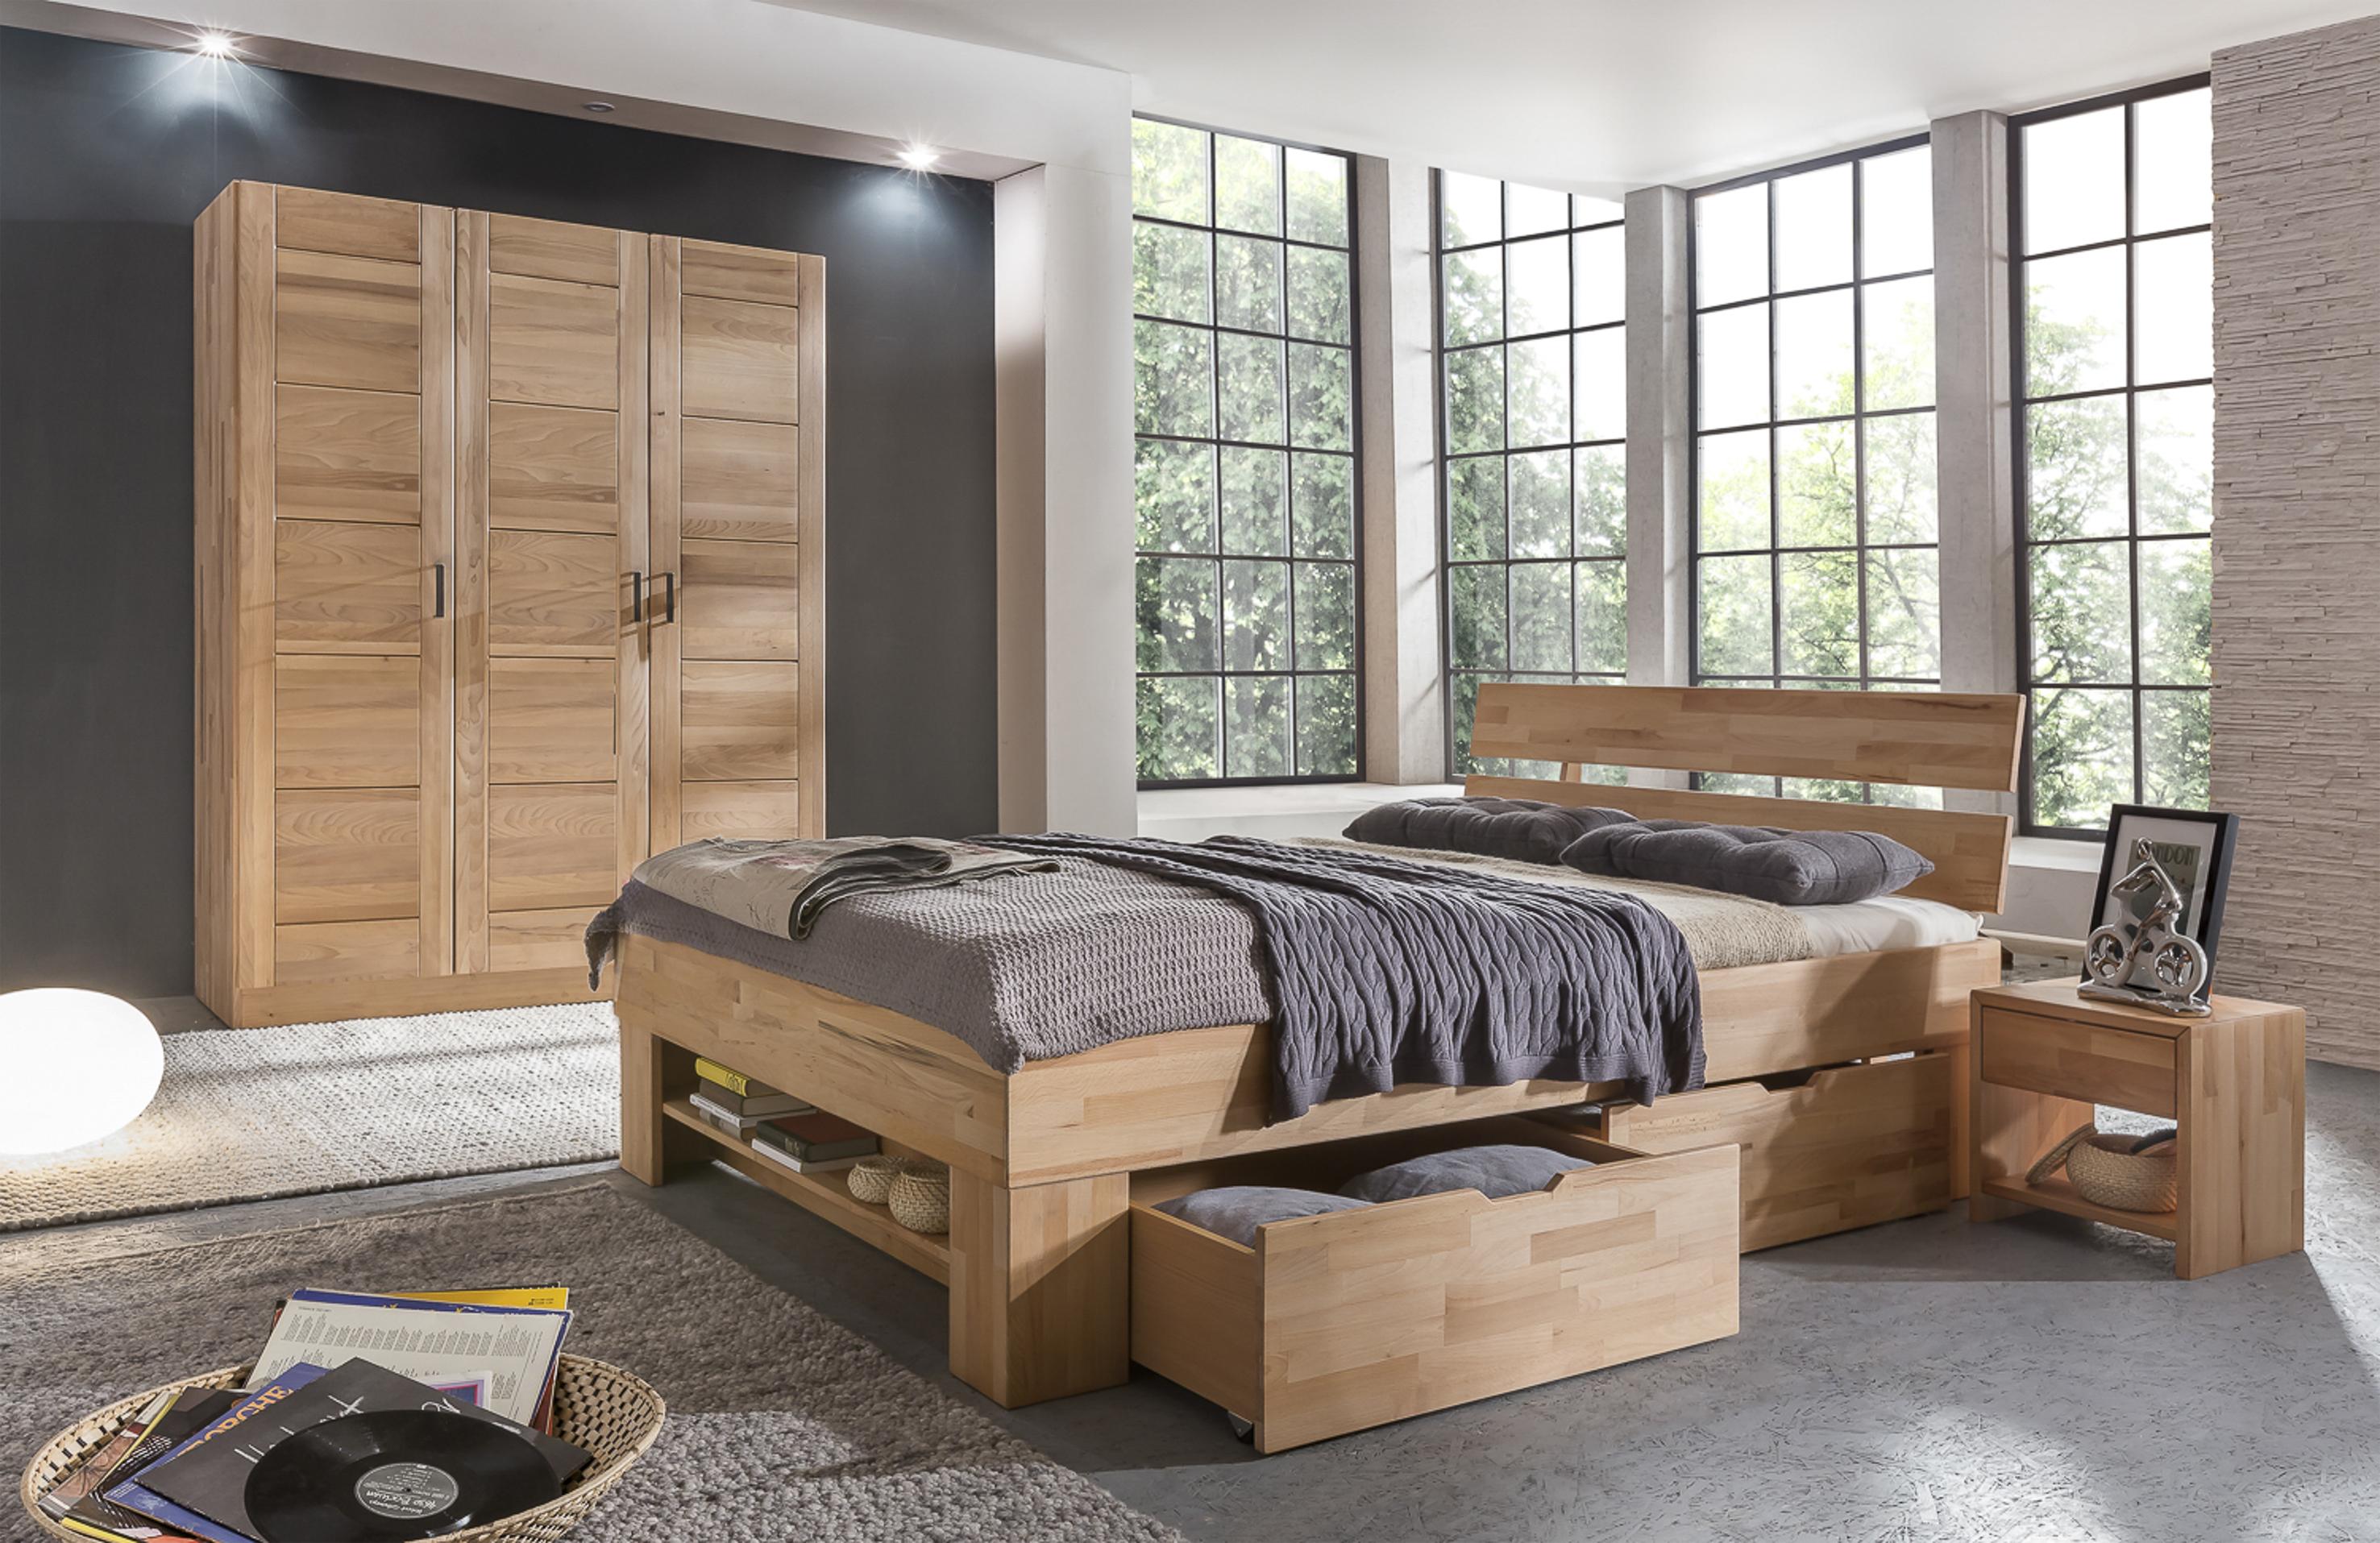 elfo kleiderschrank pia 3 kernbuche teilmassiv 3t riger. Black Bedroom Furniture Sets. Home Design Ideas